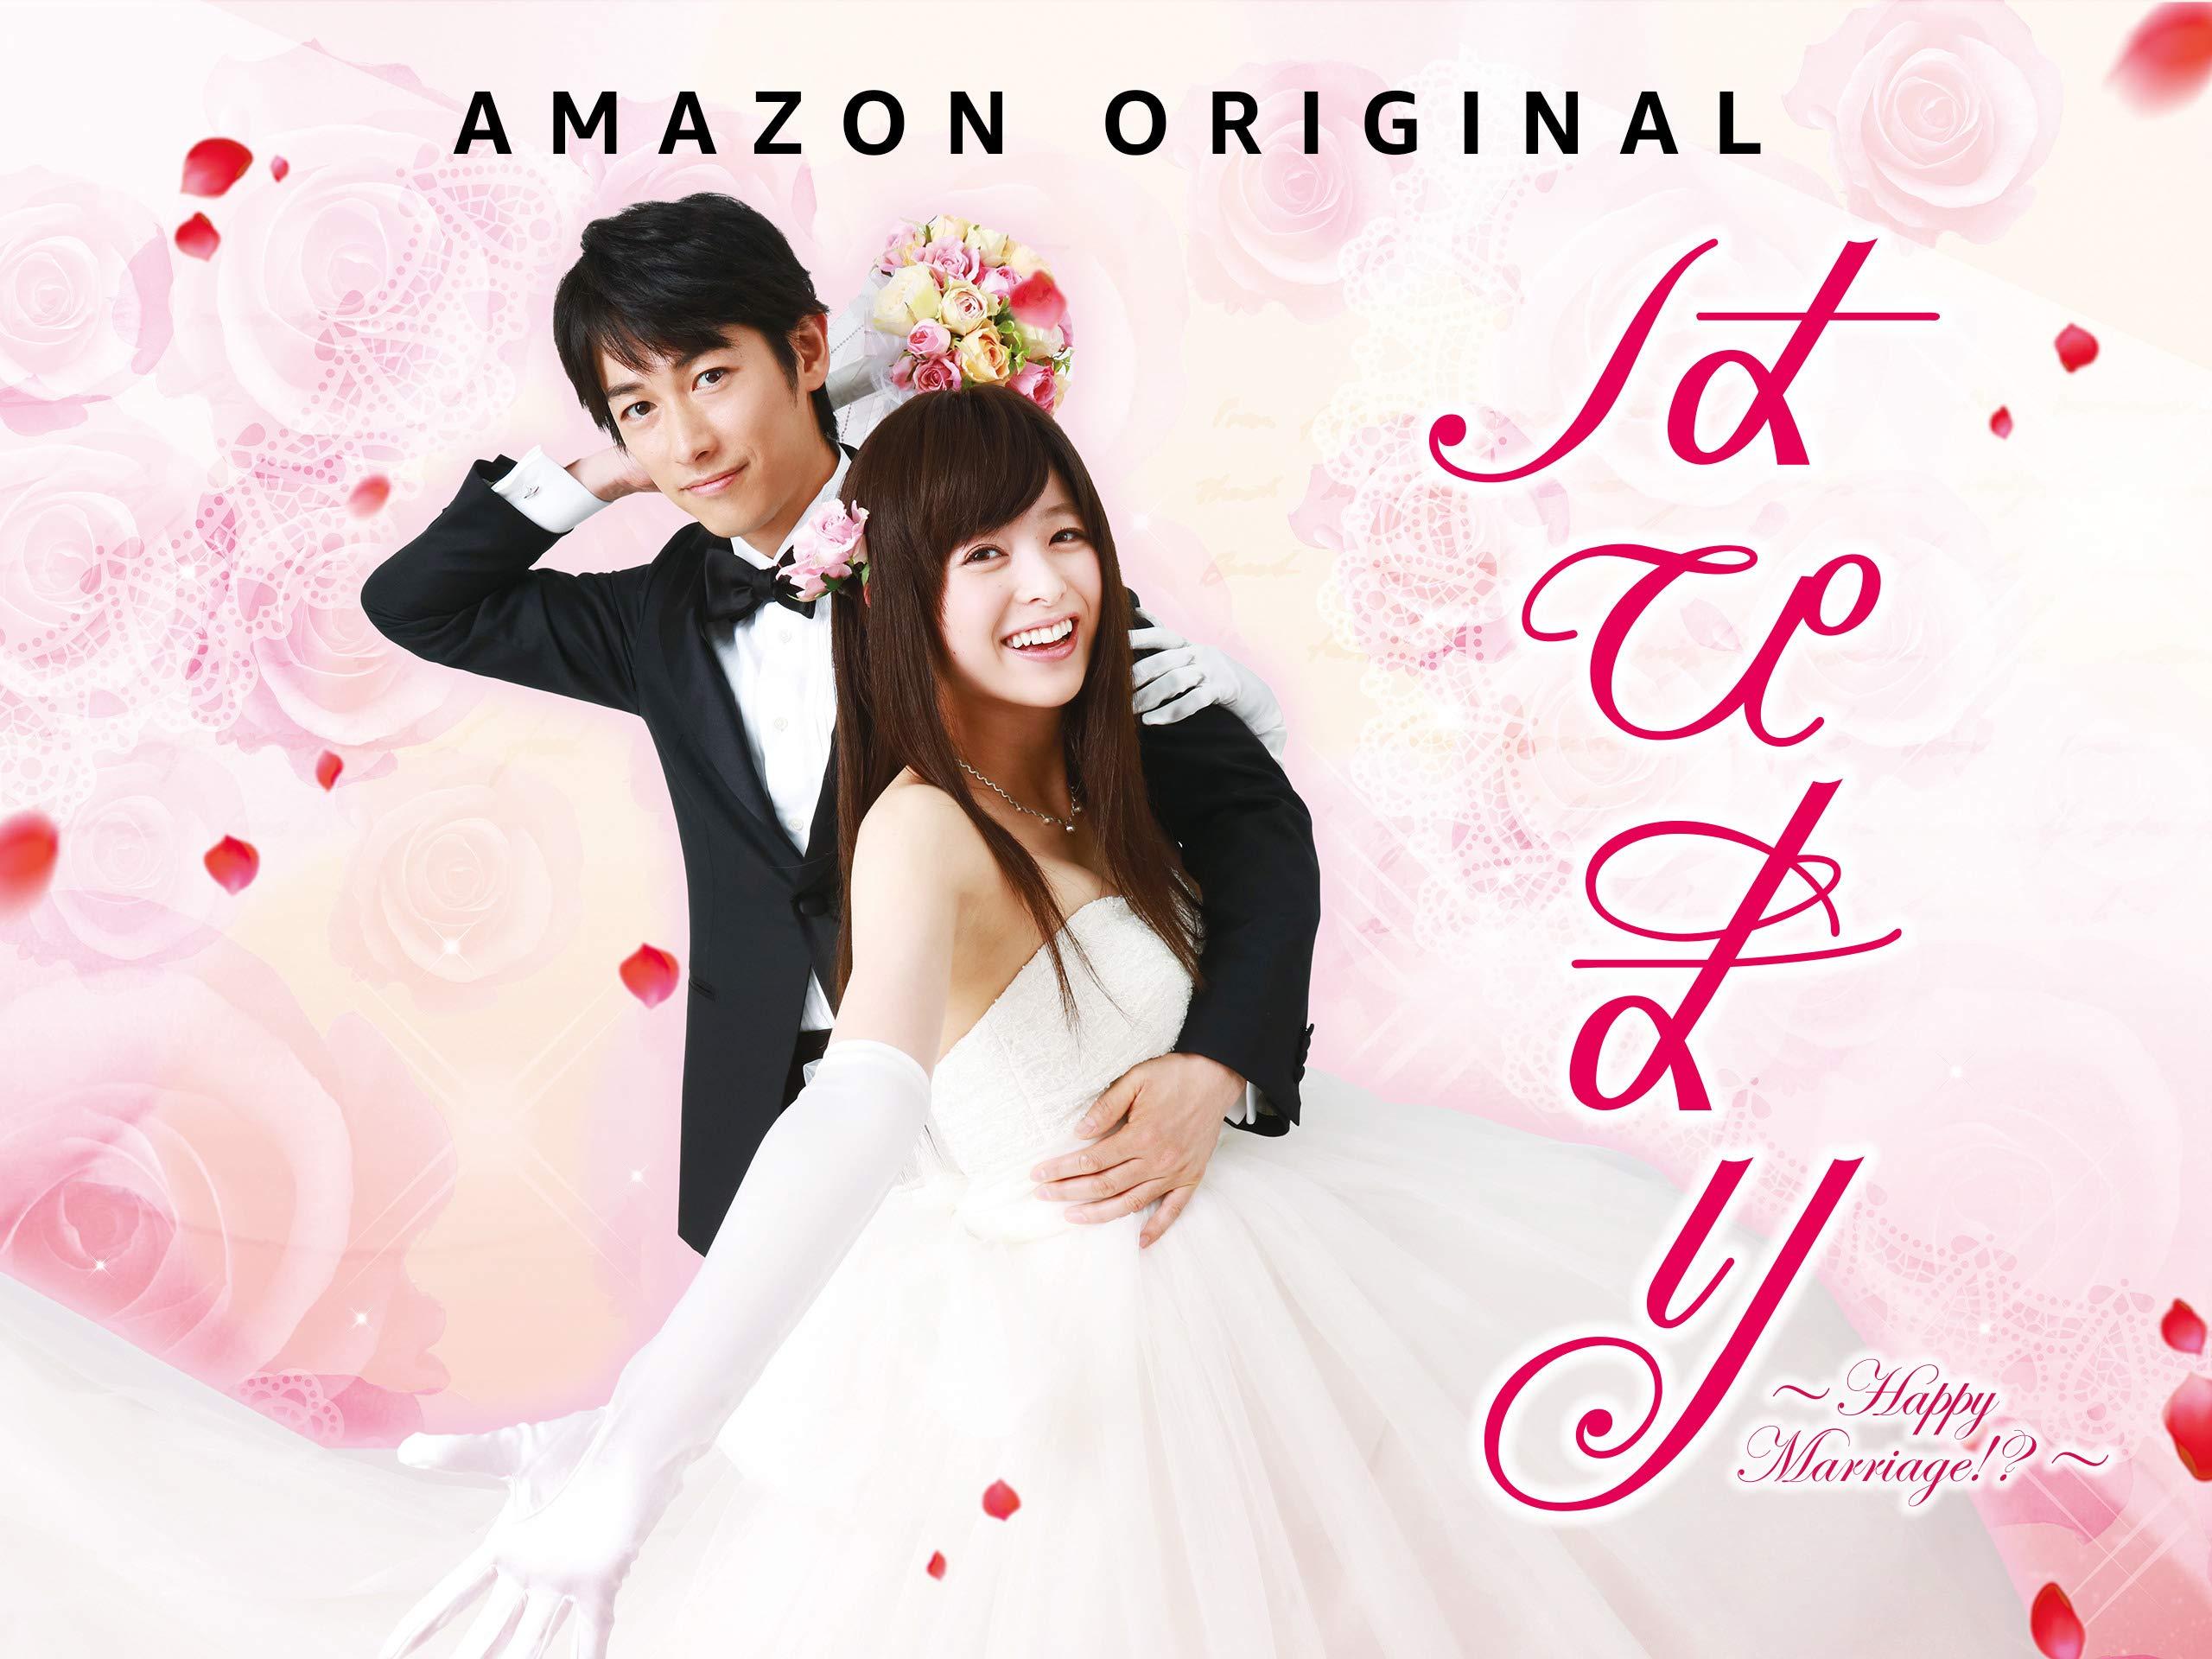 Amazon com: Watch Happy Marriage!? Season 1 | Prime Video